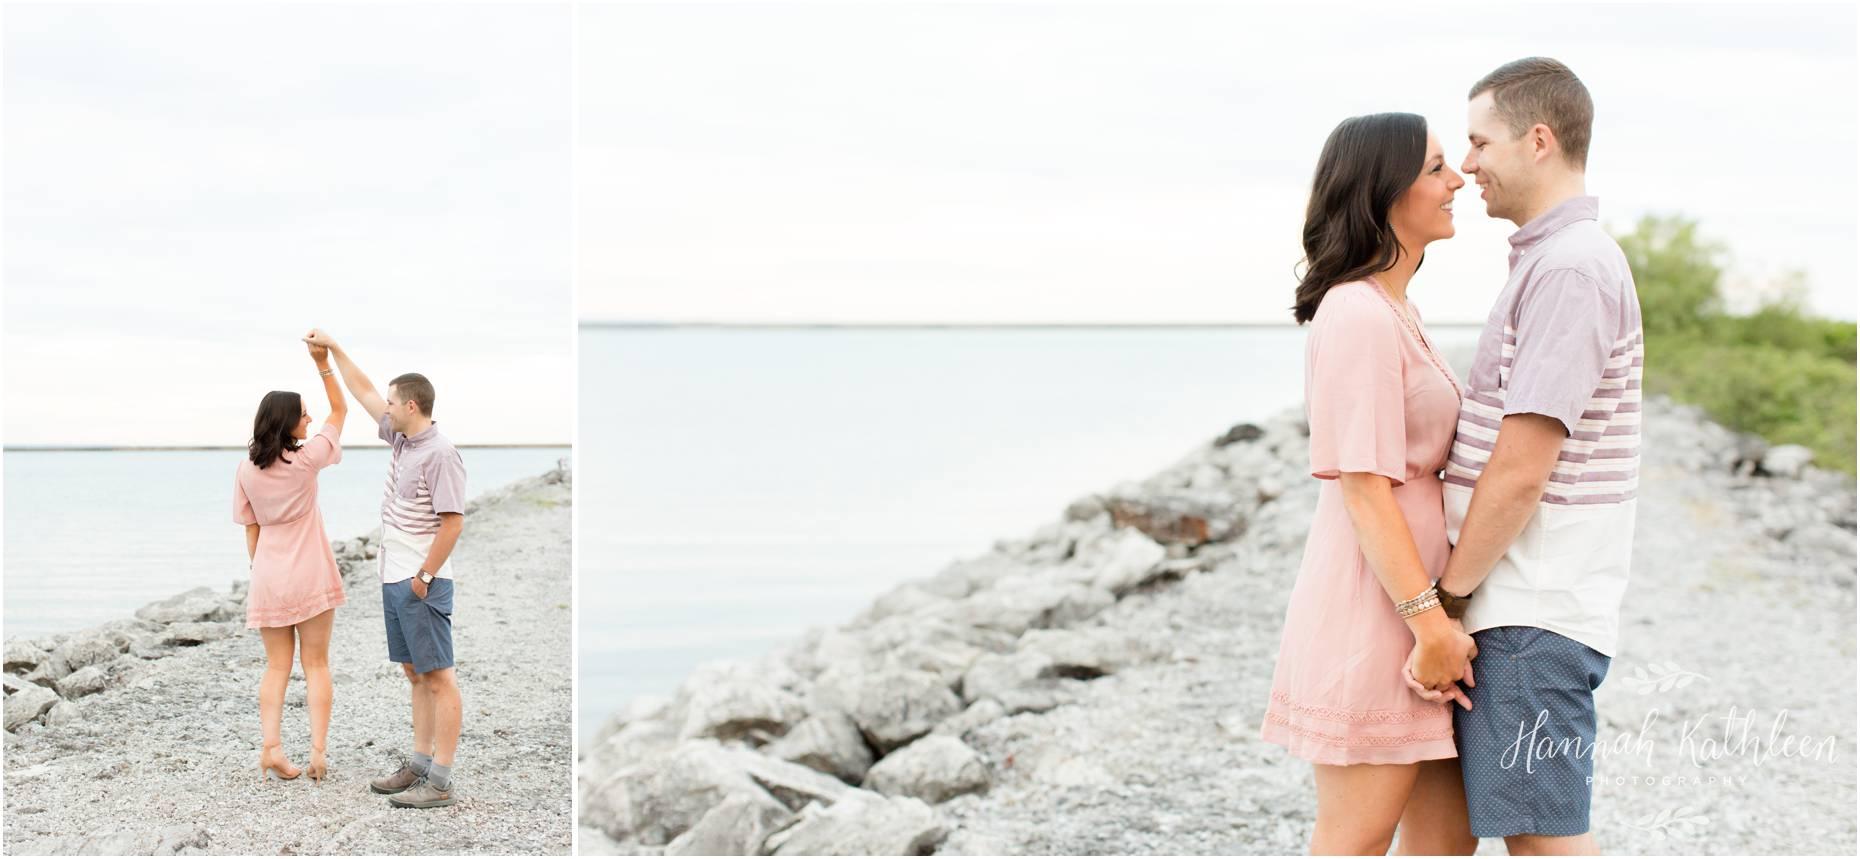 WNY_Engagement_Photography_Daniel_Marissa